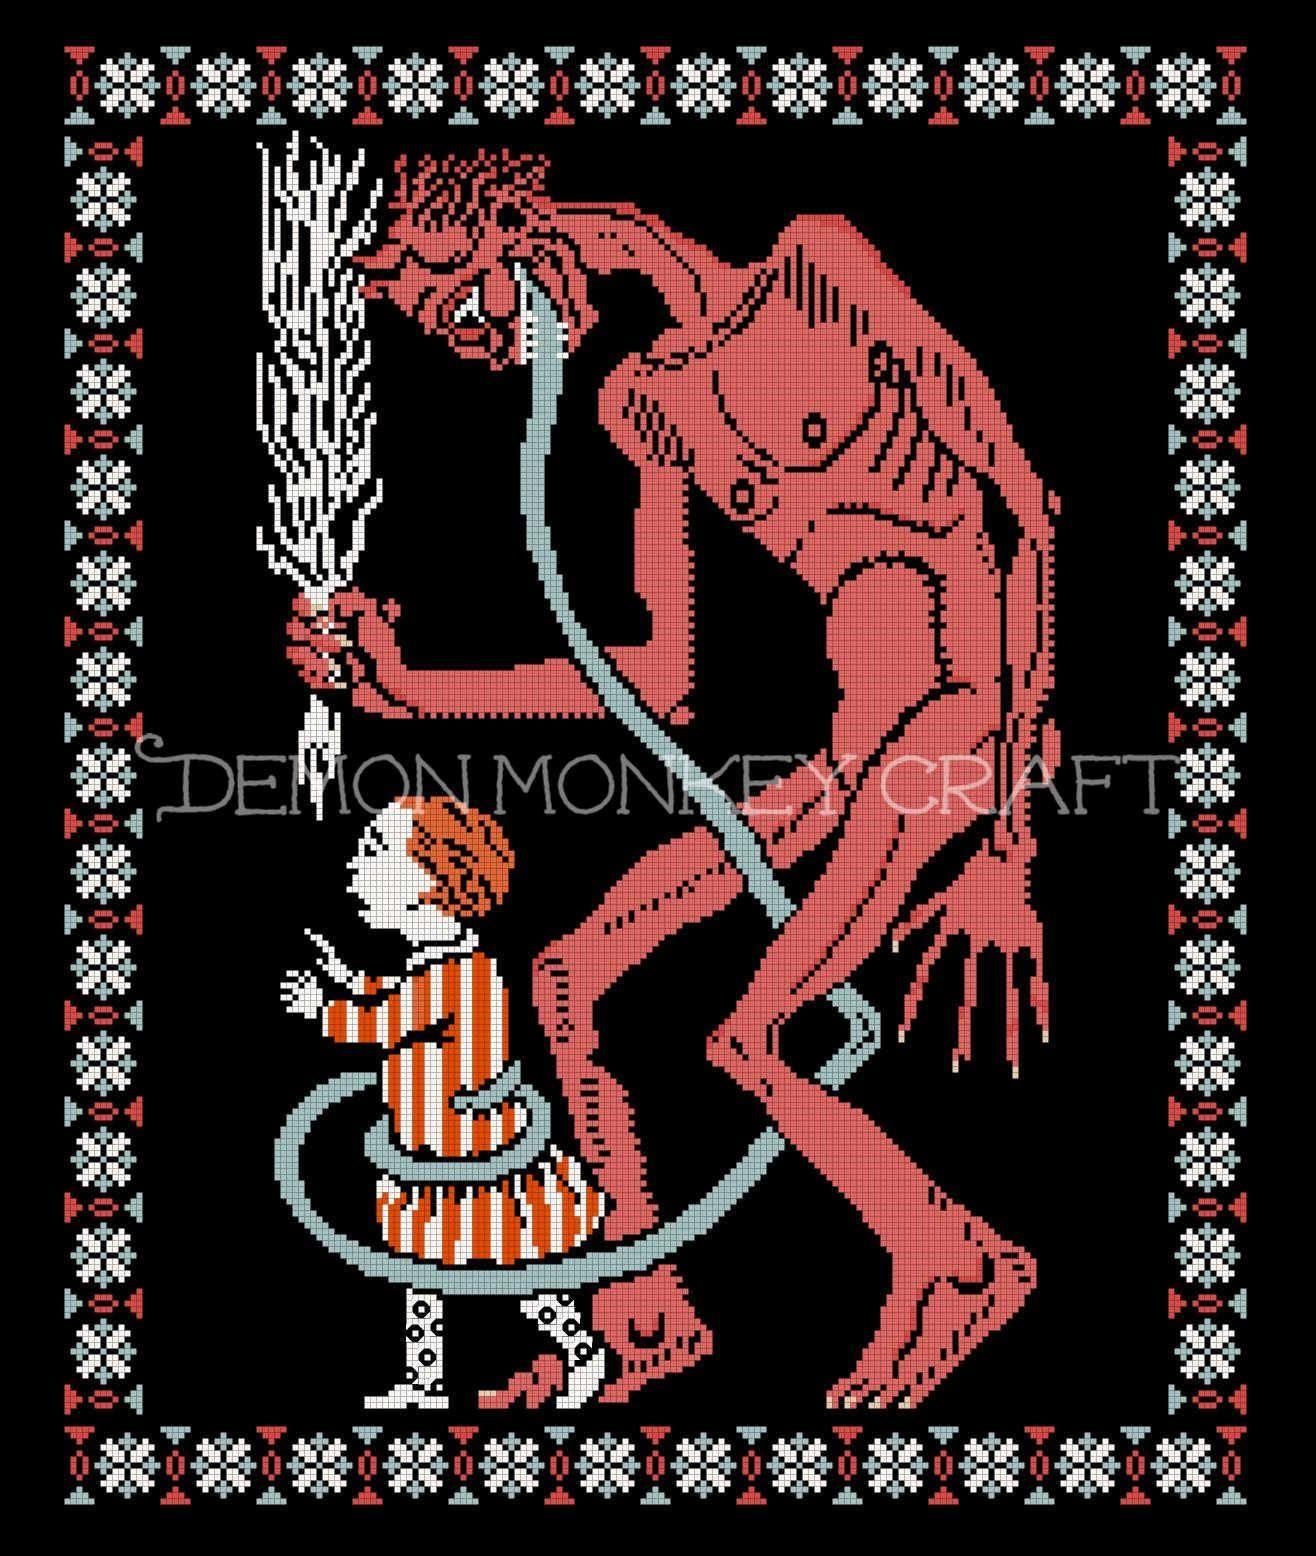 Pin On Demon Monkey Craft Patterns My Work Copyright